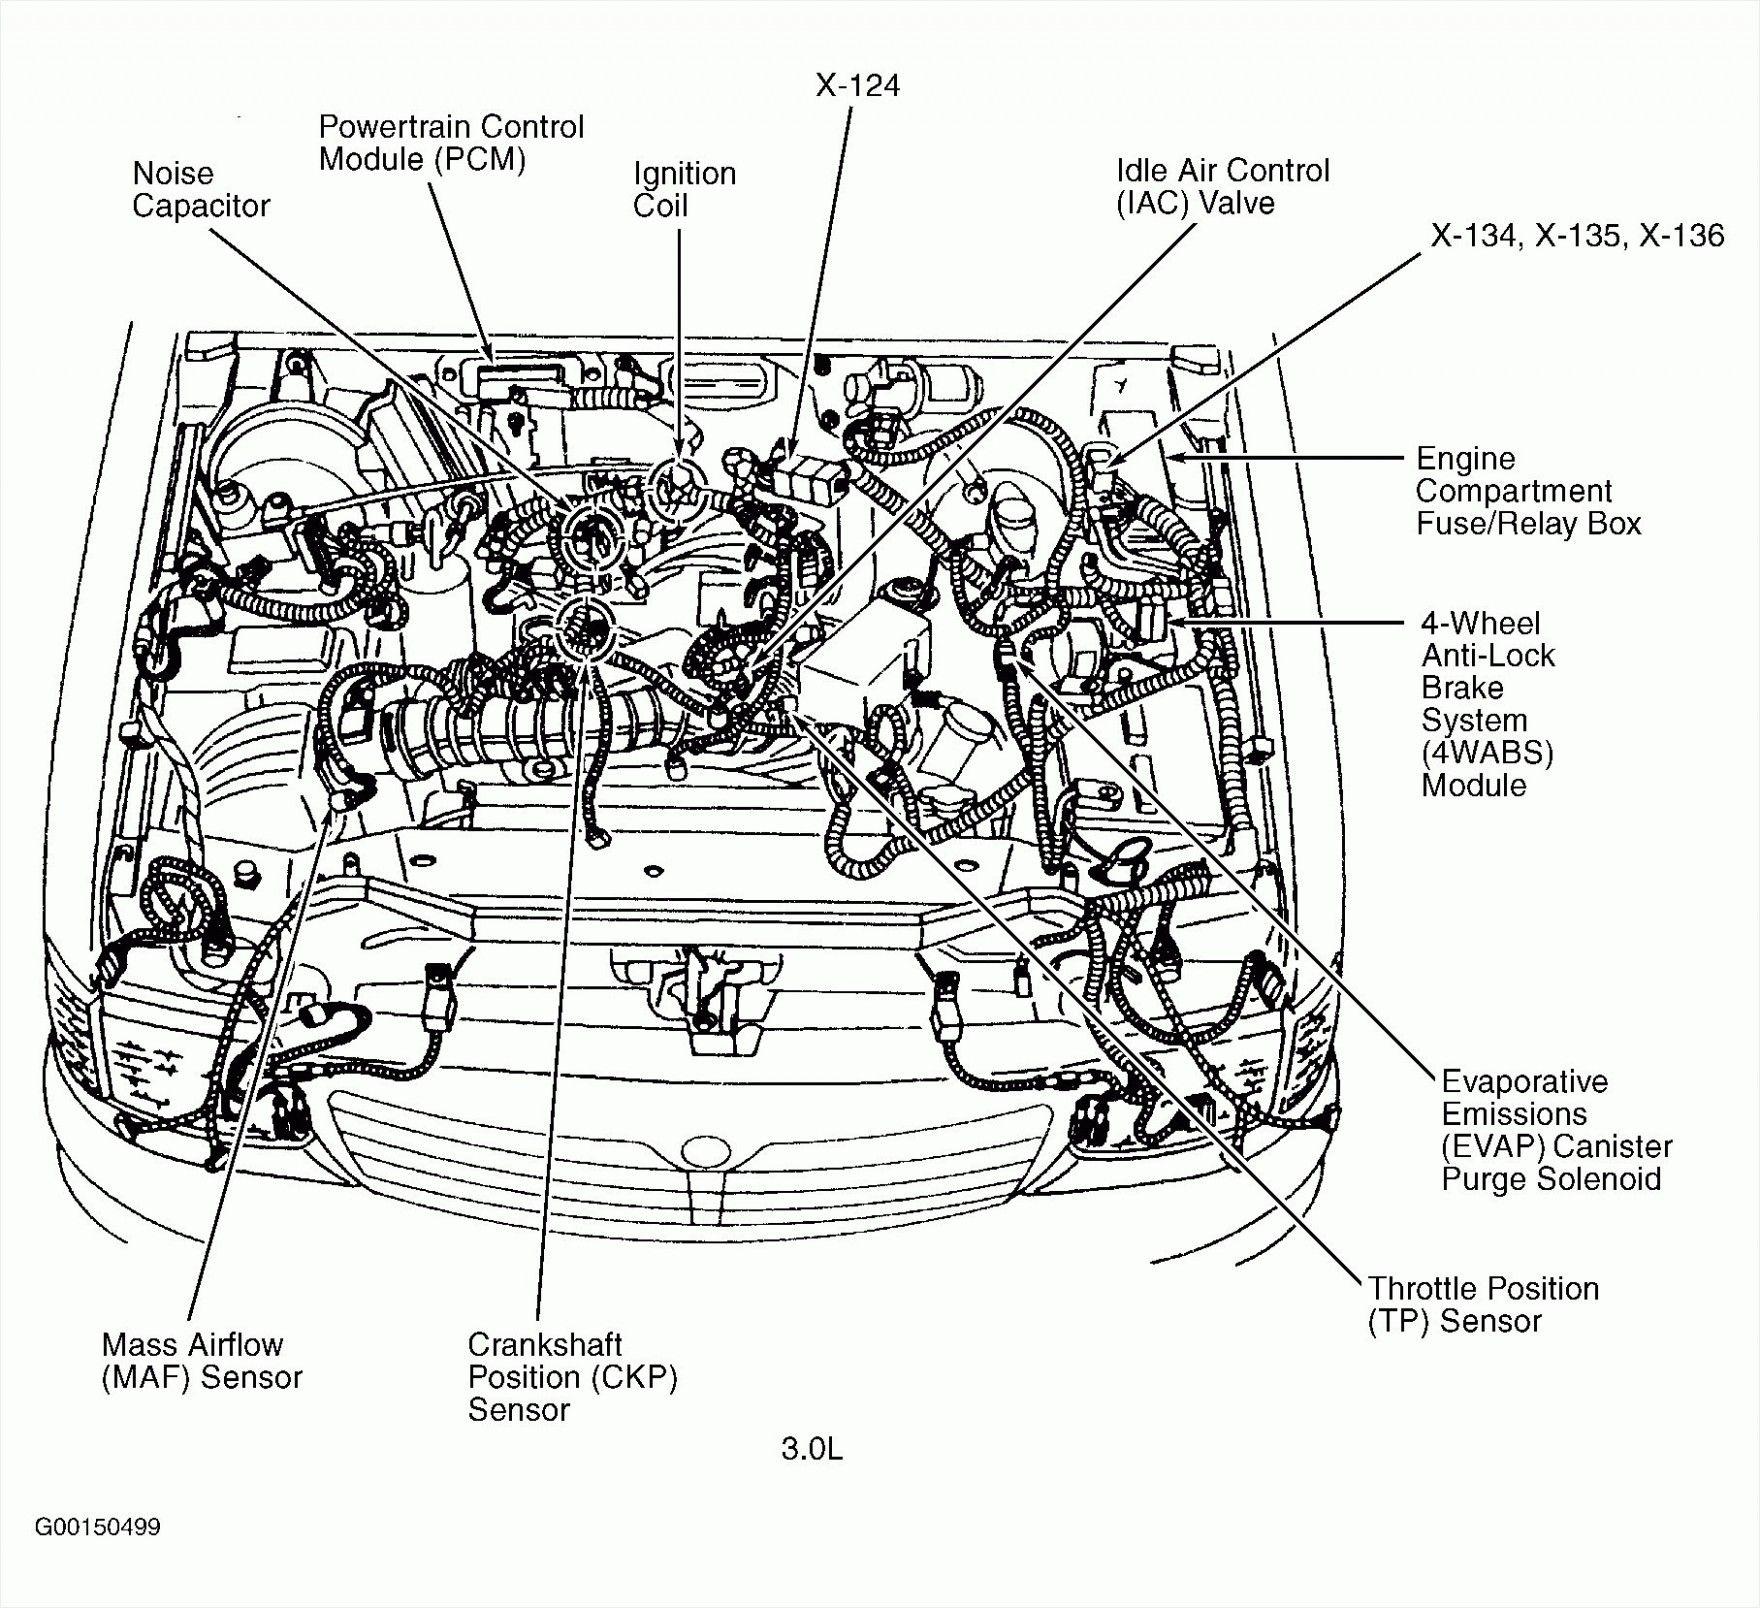 engine bay diagram of 1994 gmc